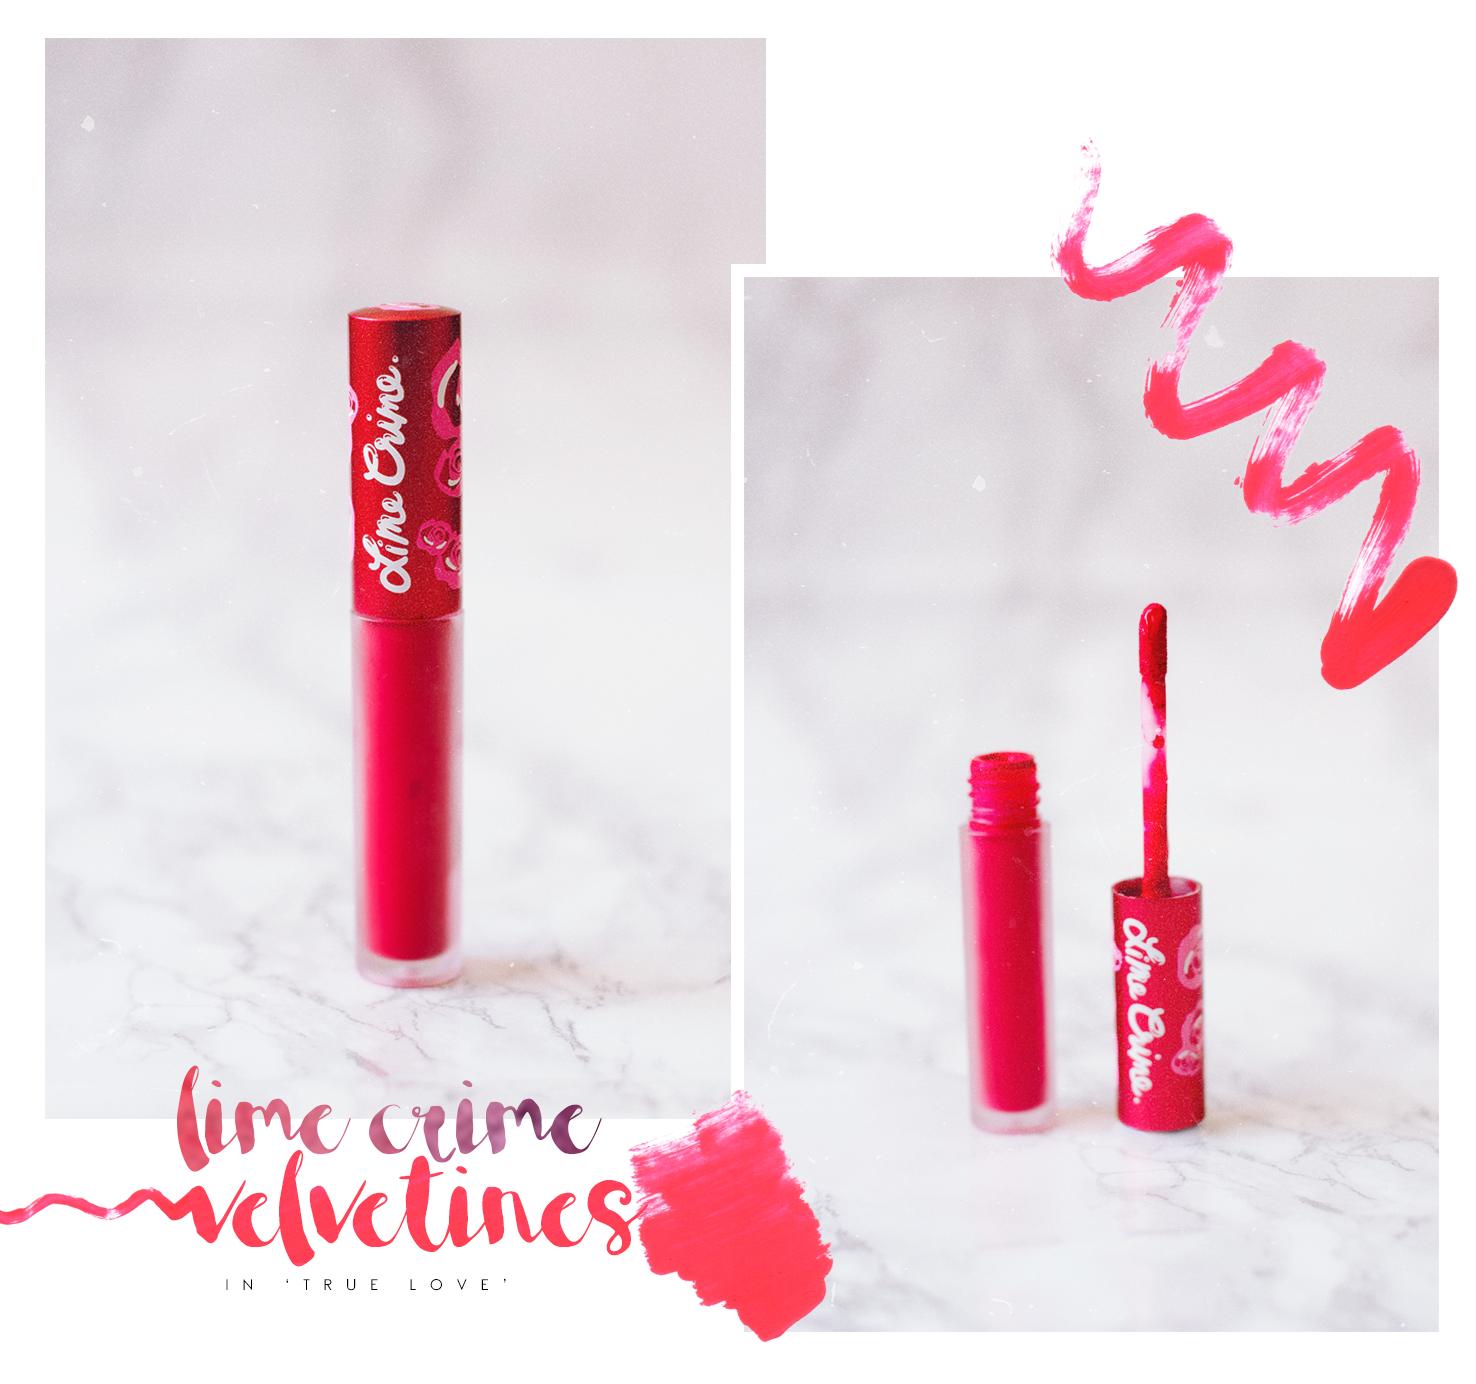 f8194-Lime-Crime-Velvetines-True-Love-Review-Liquid-Lipstick.pngLime-Crime-Velvetines-True-Love-Review-Liquid-Lipstick.png